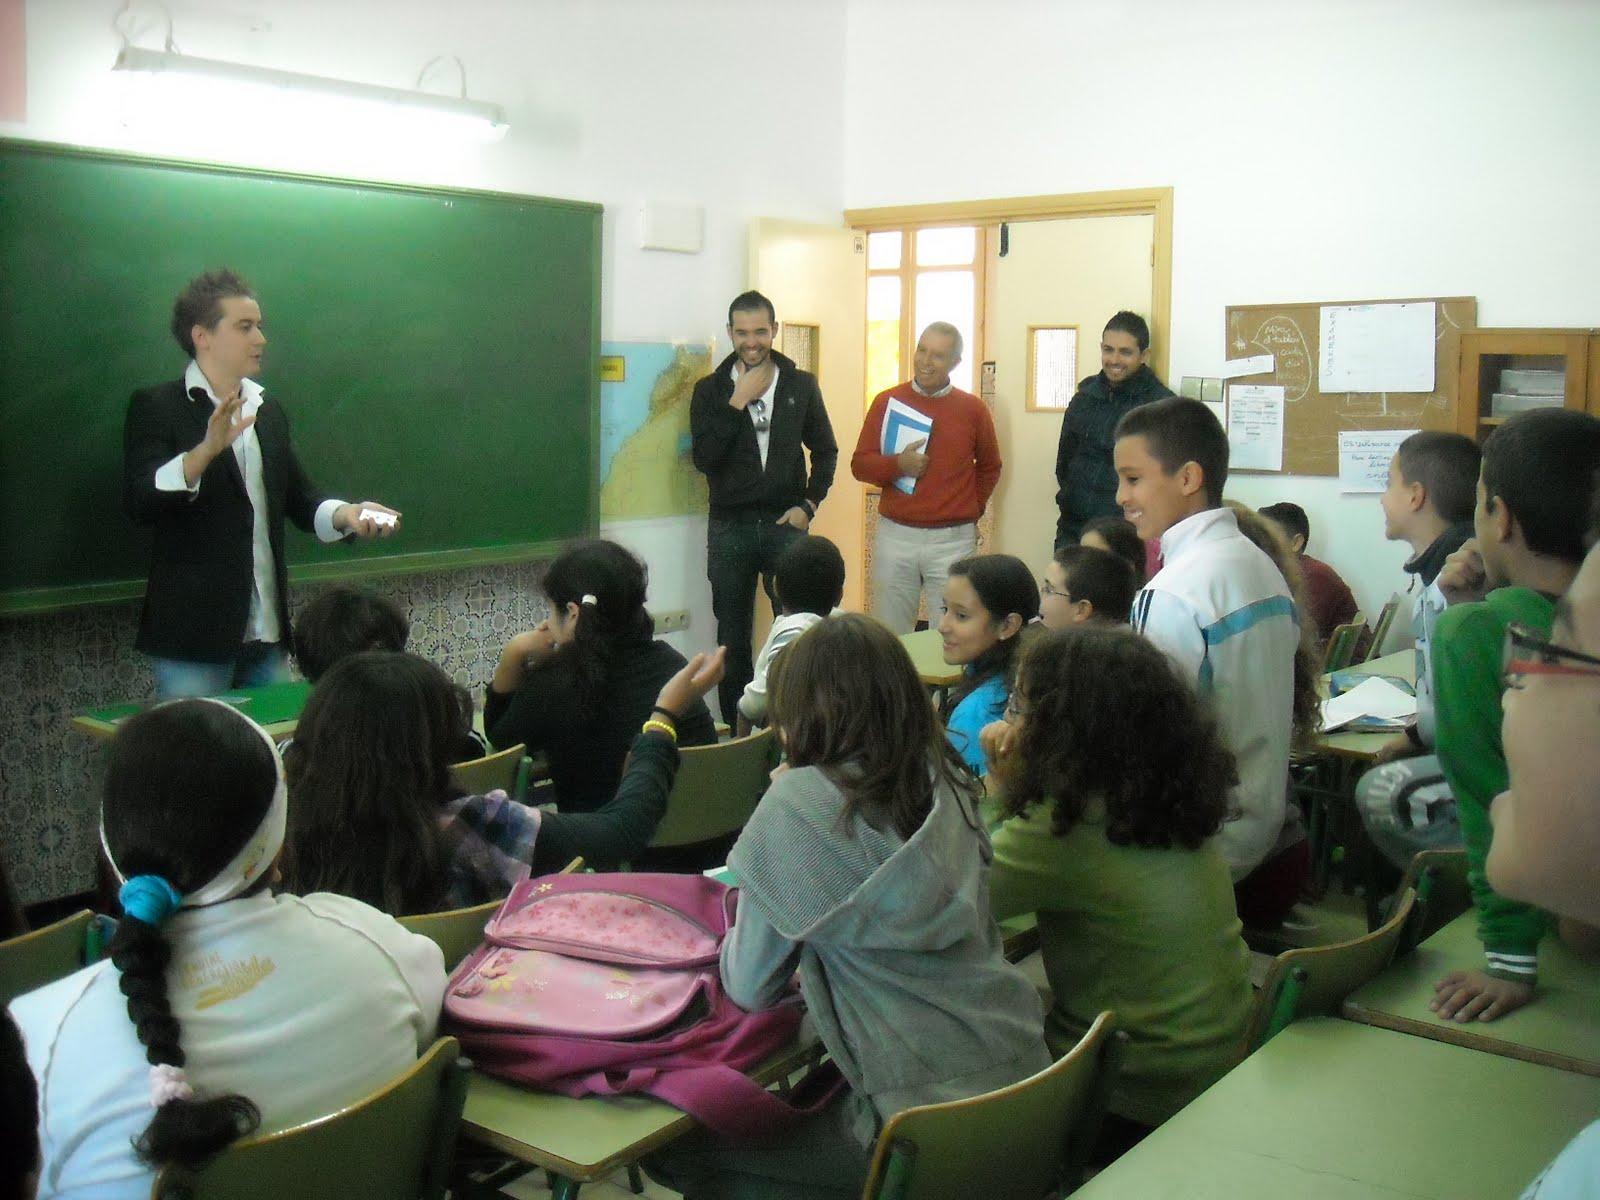 Ie melchor de jovellanos alhucemas aaee espect culo de for Educacion exterior marruecos